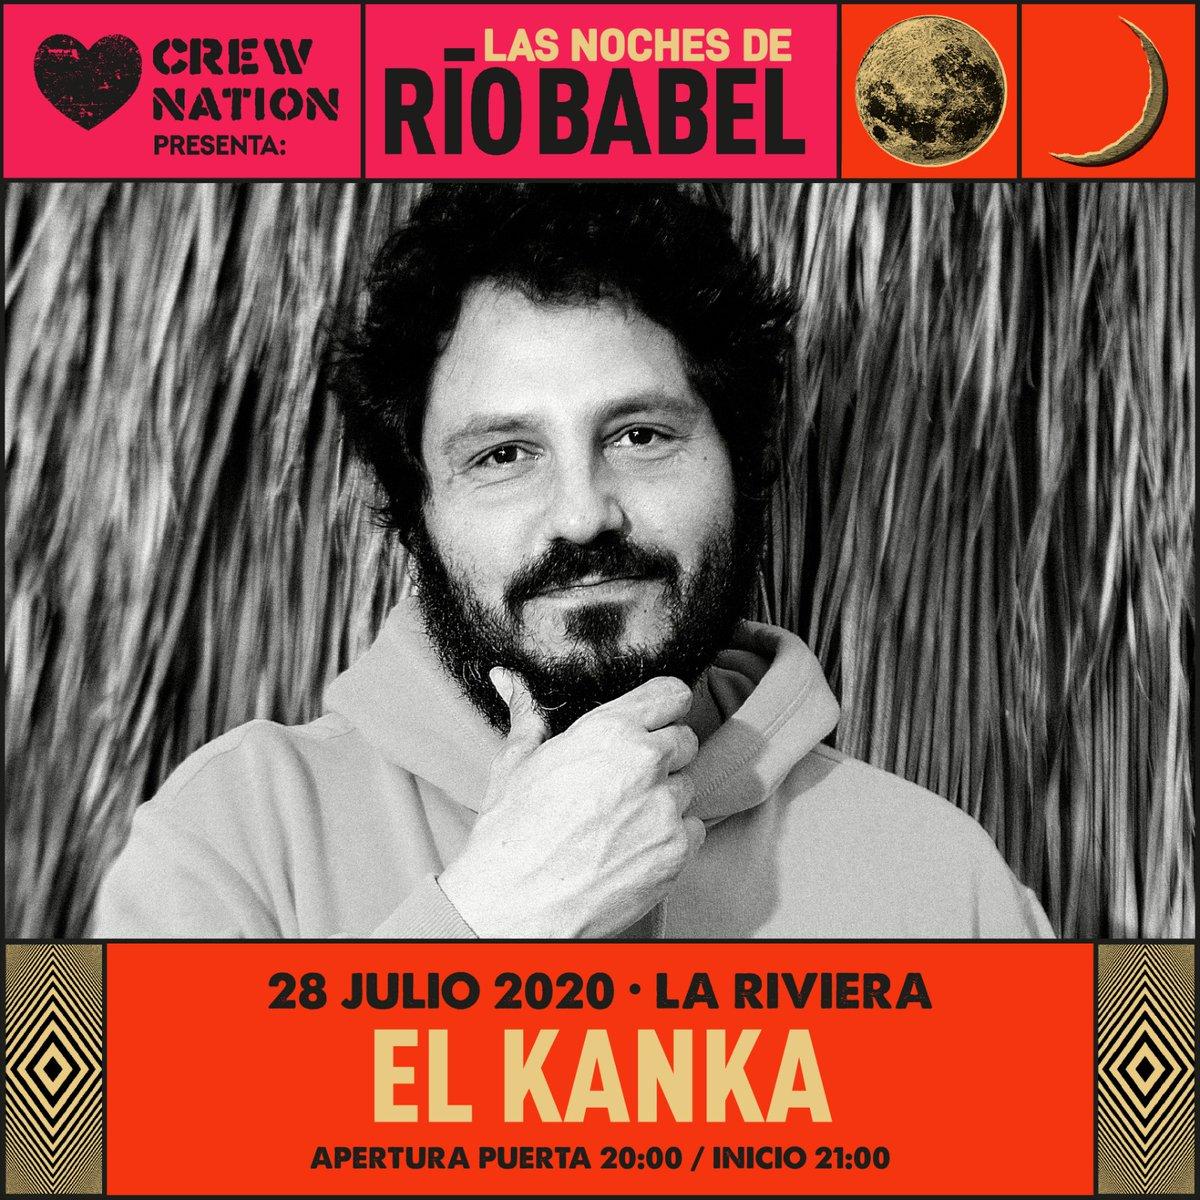 Madrid, estaba deseando decirte esto... ¡ENTRADAS YA A LA VENTA!  #LasNochesDeBabel #CrewNation #ElKanka #PlanB https://t.co/moZ6GCdhTN